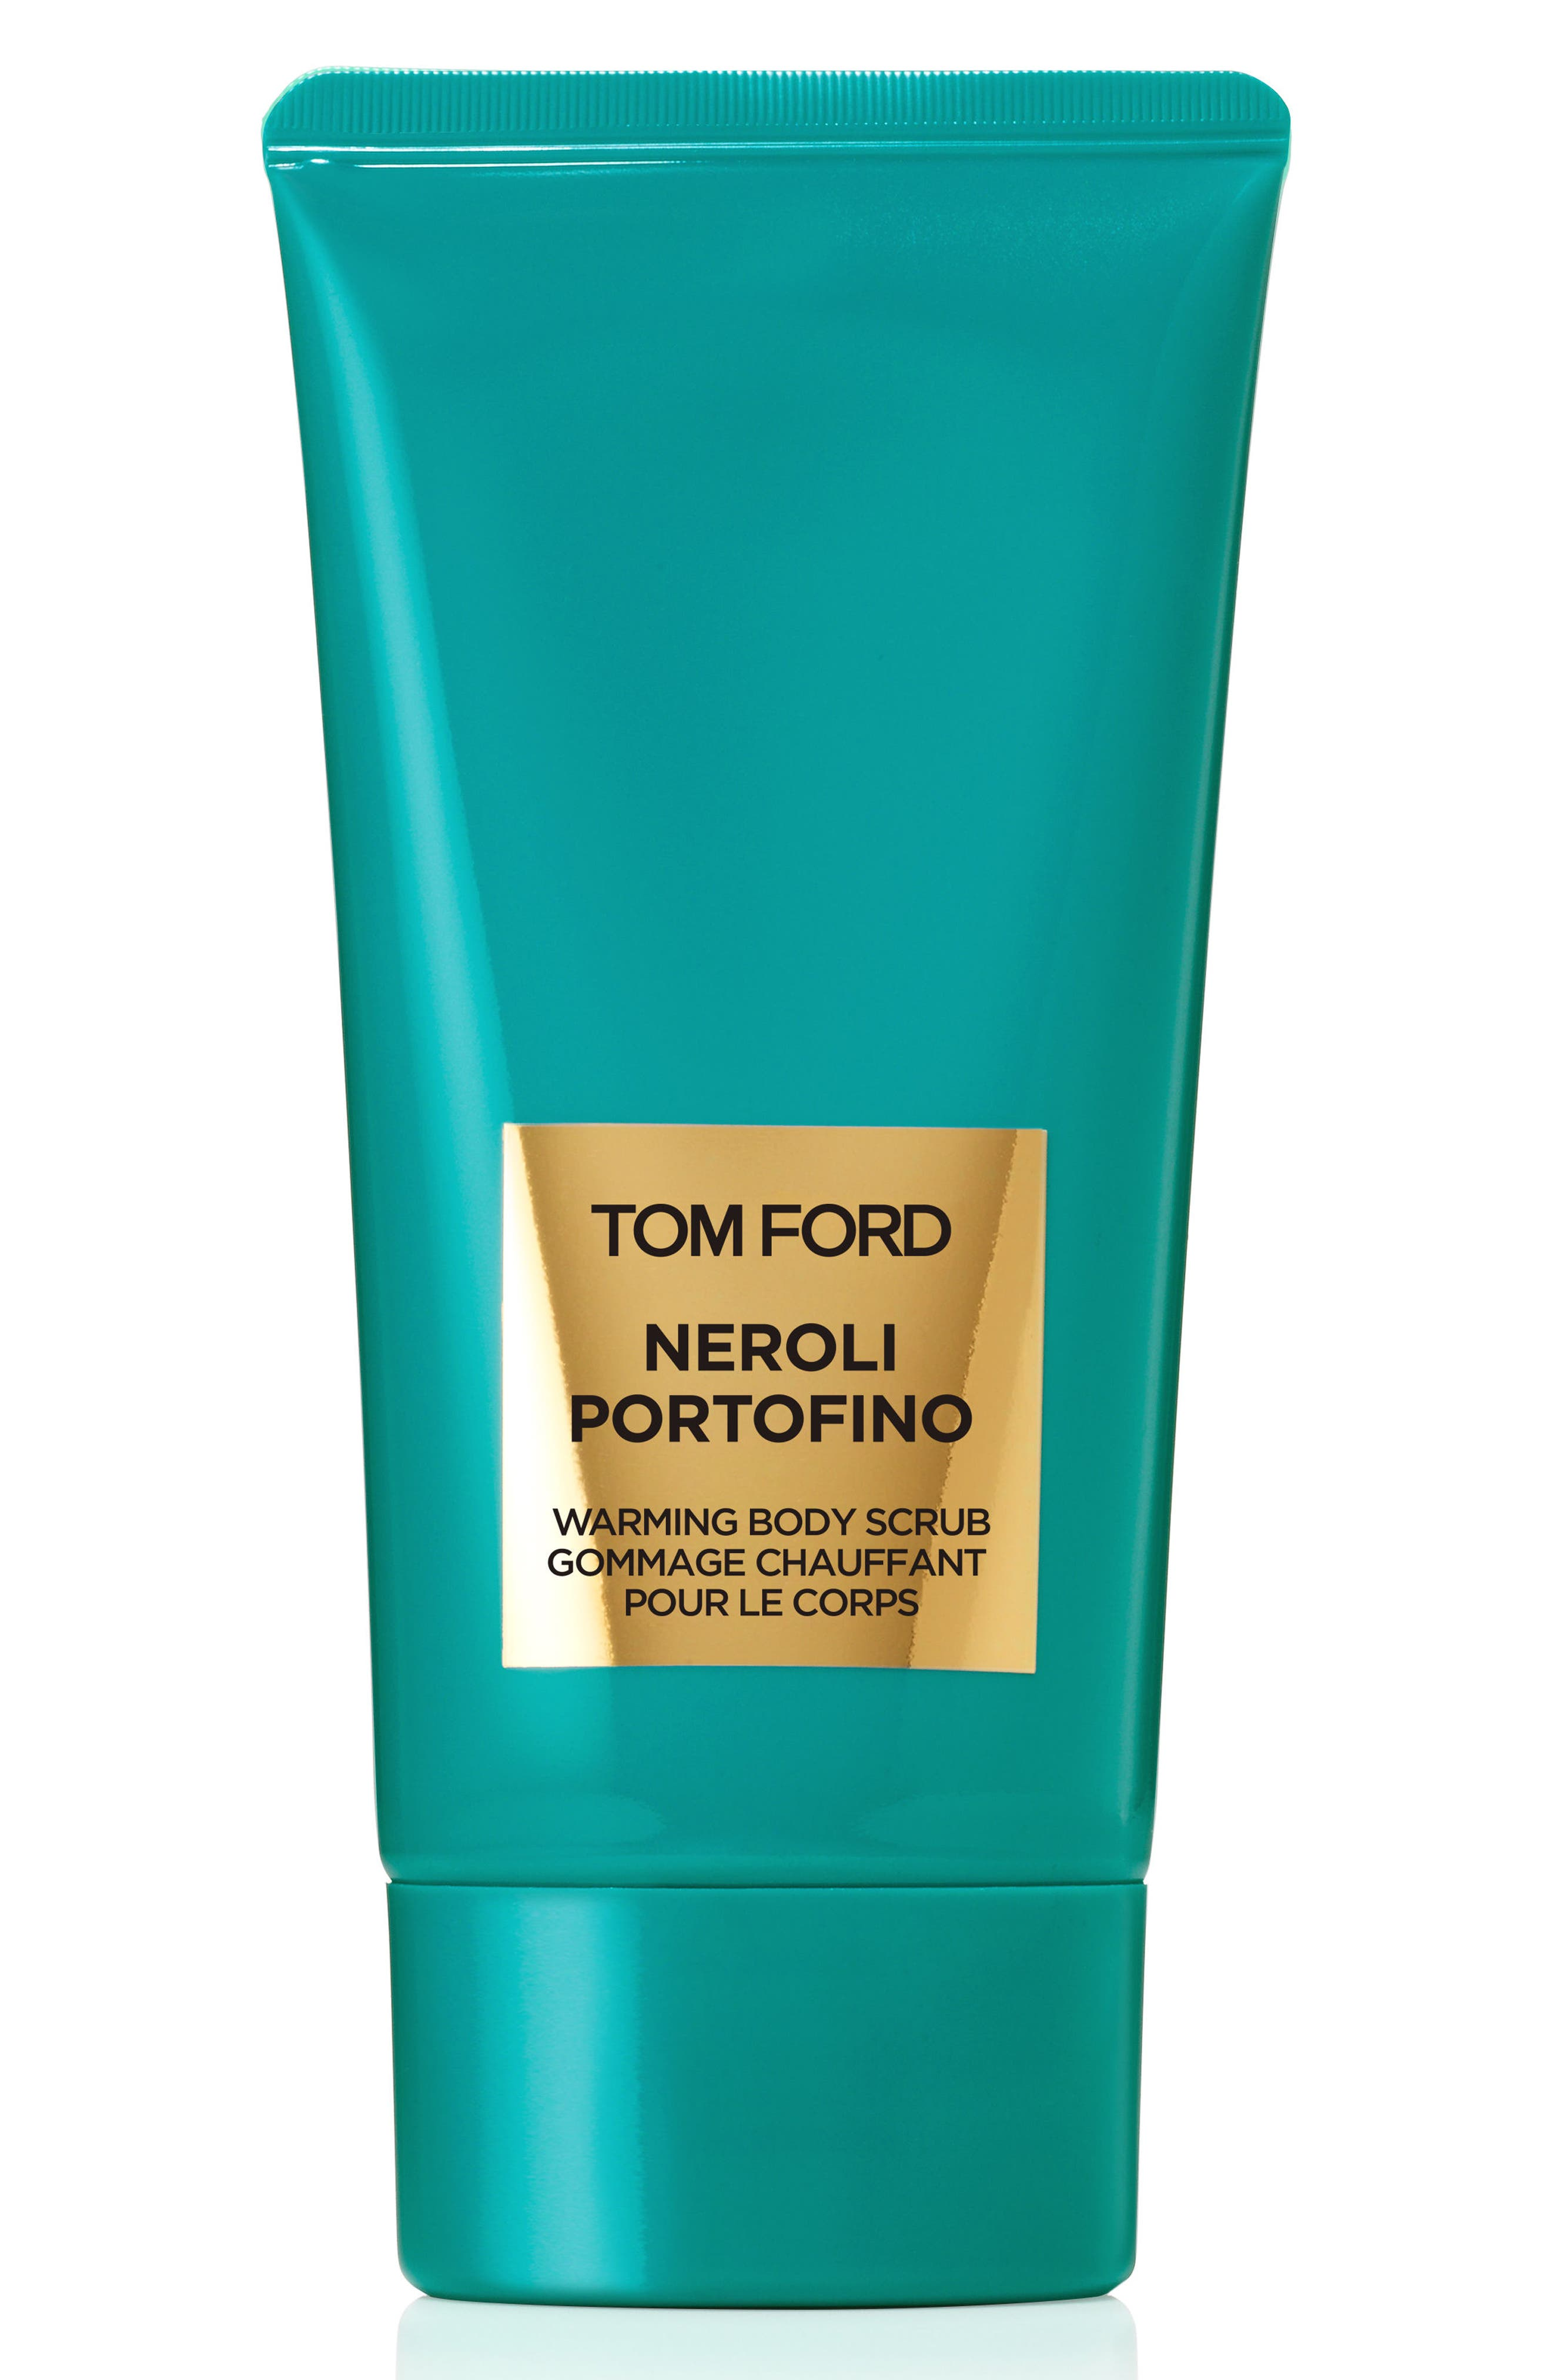 Tom Ford Neroli Portofino Warming Body Scrub